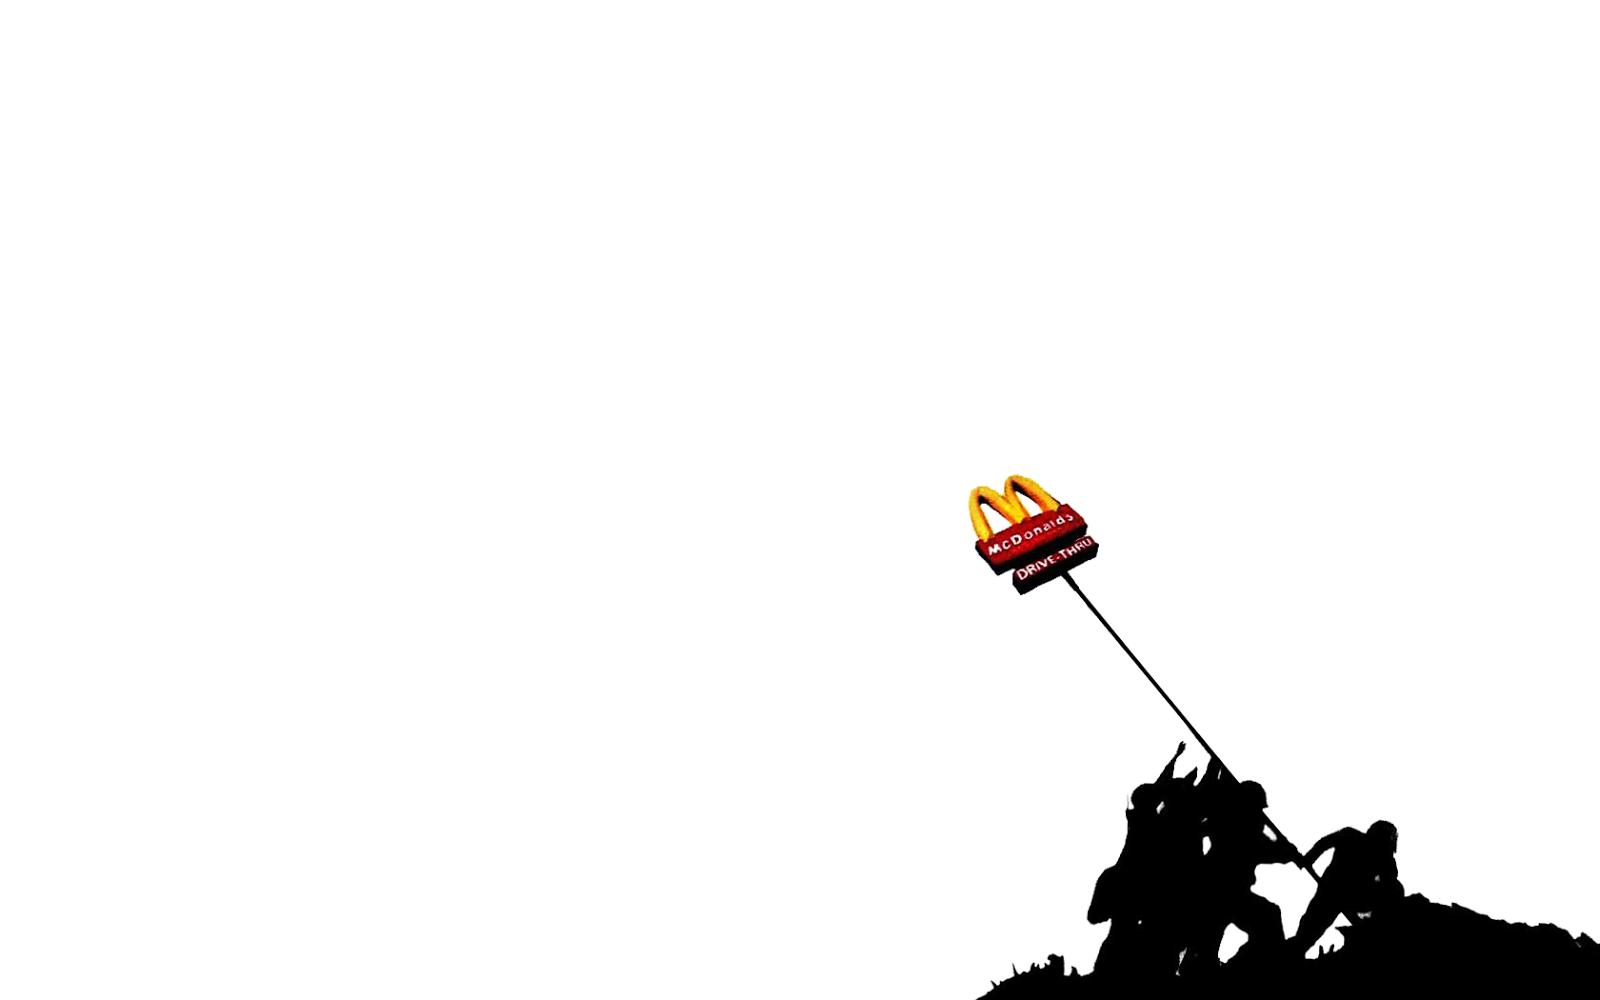 Free Download Banksy Wallpapers Hd Desktop Wallpapers Download